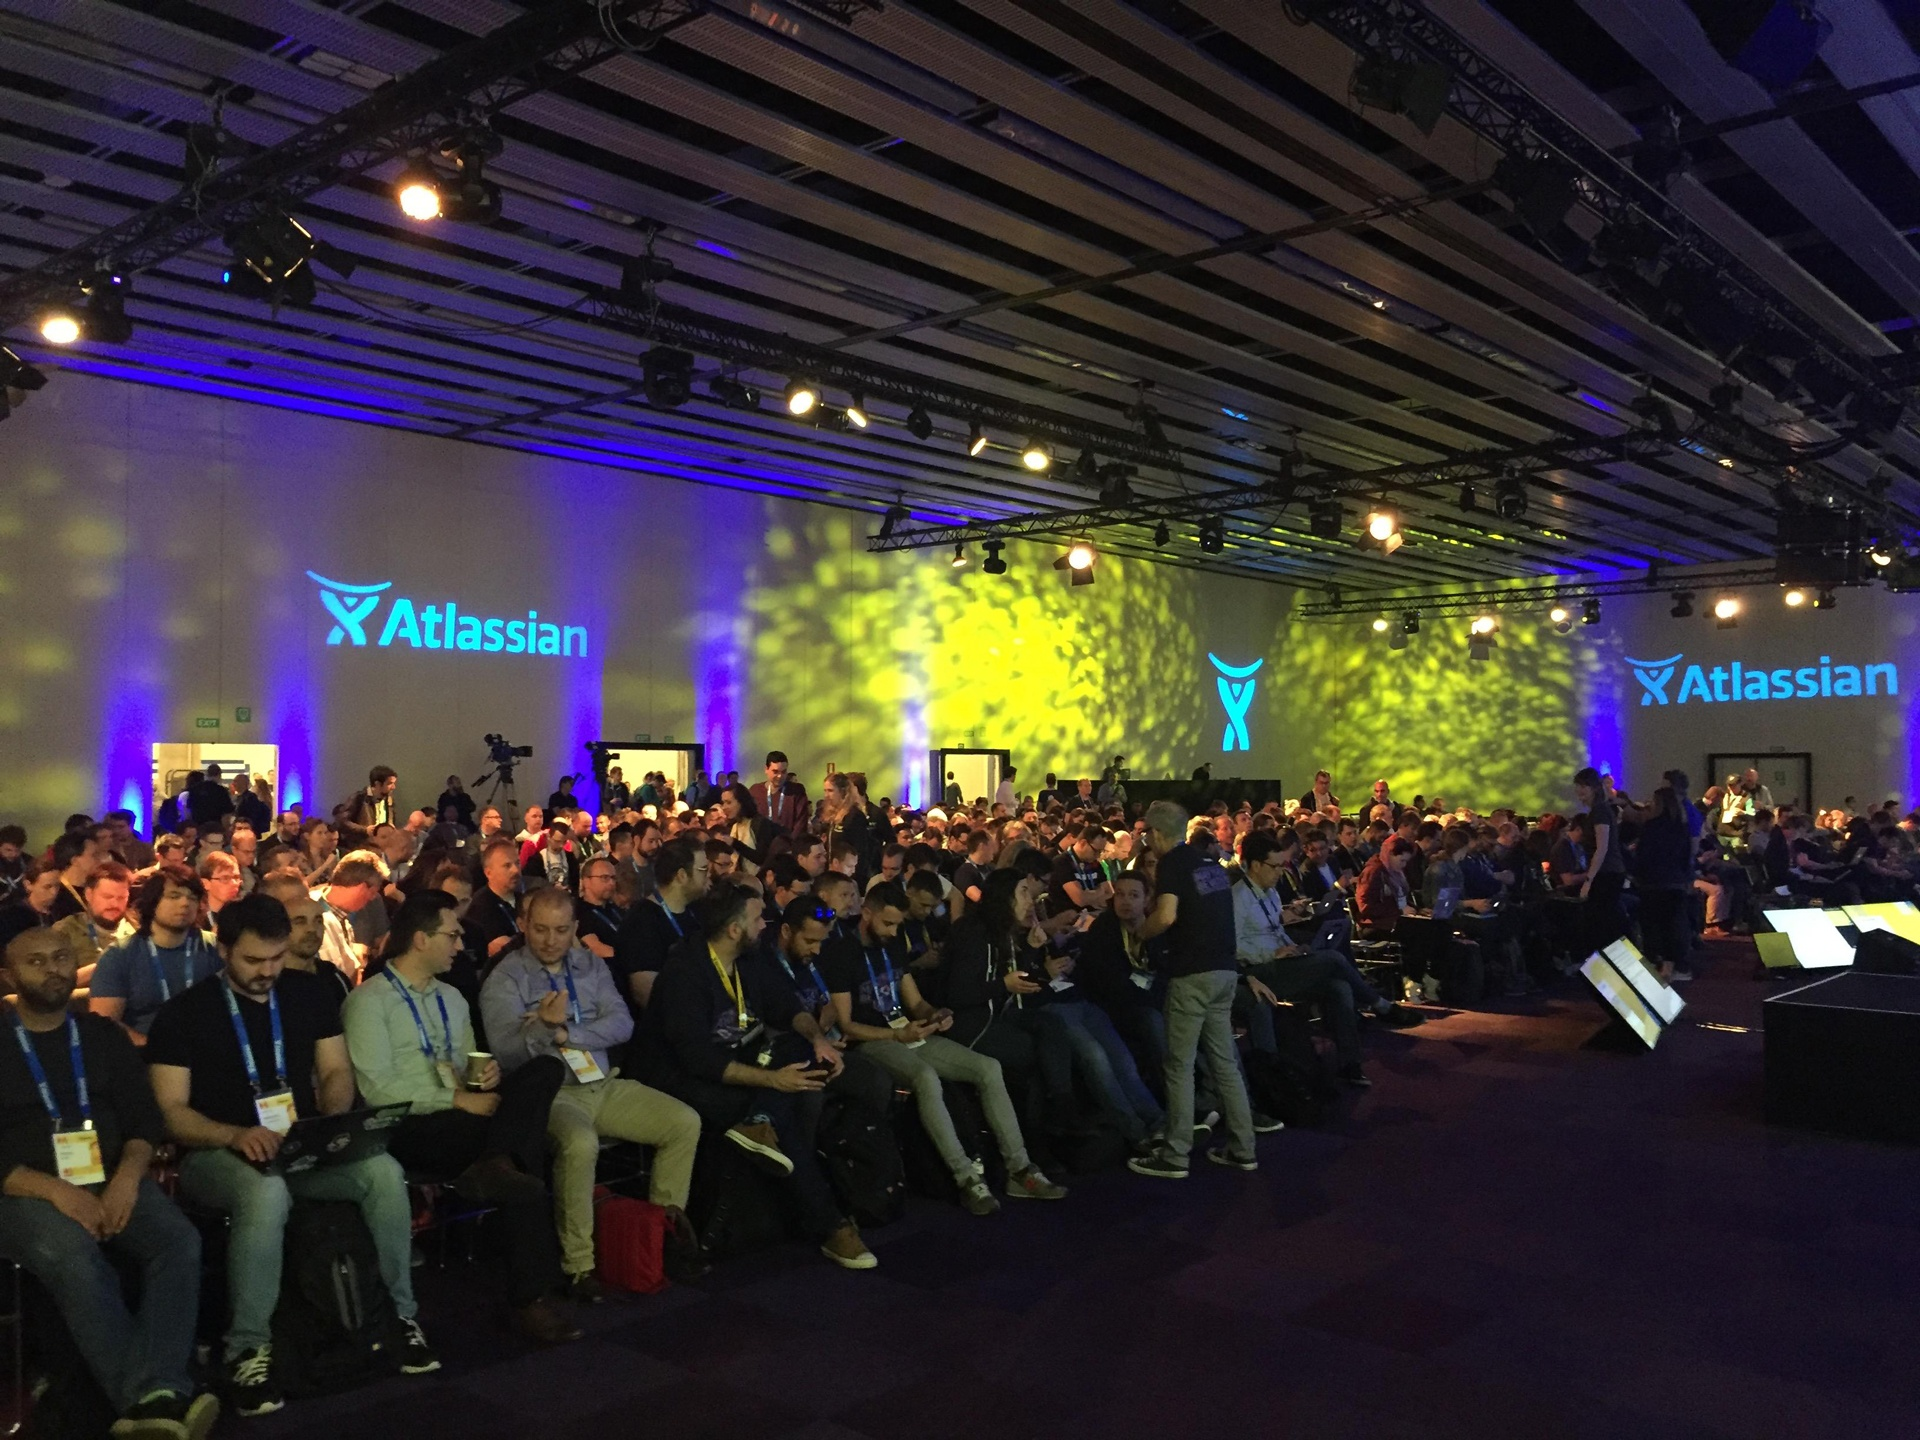 Atlassia Summit Conference